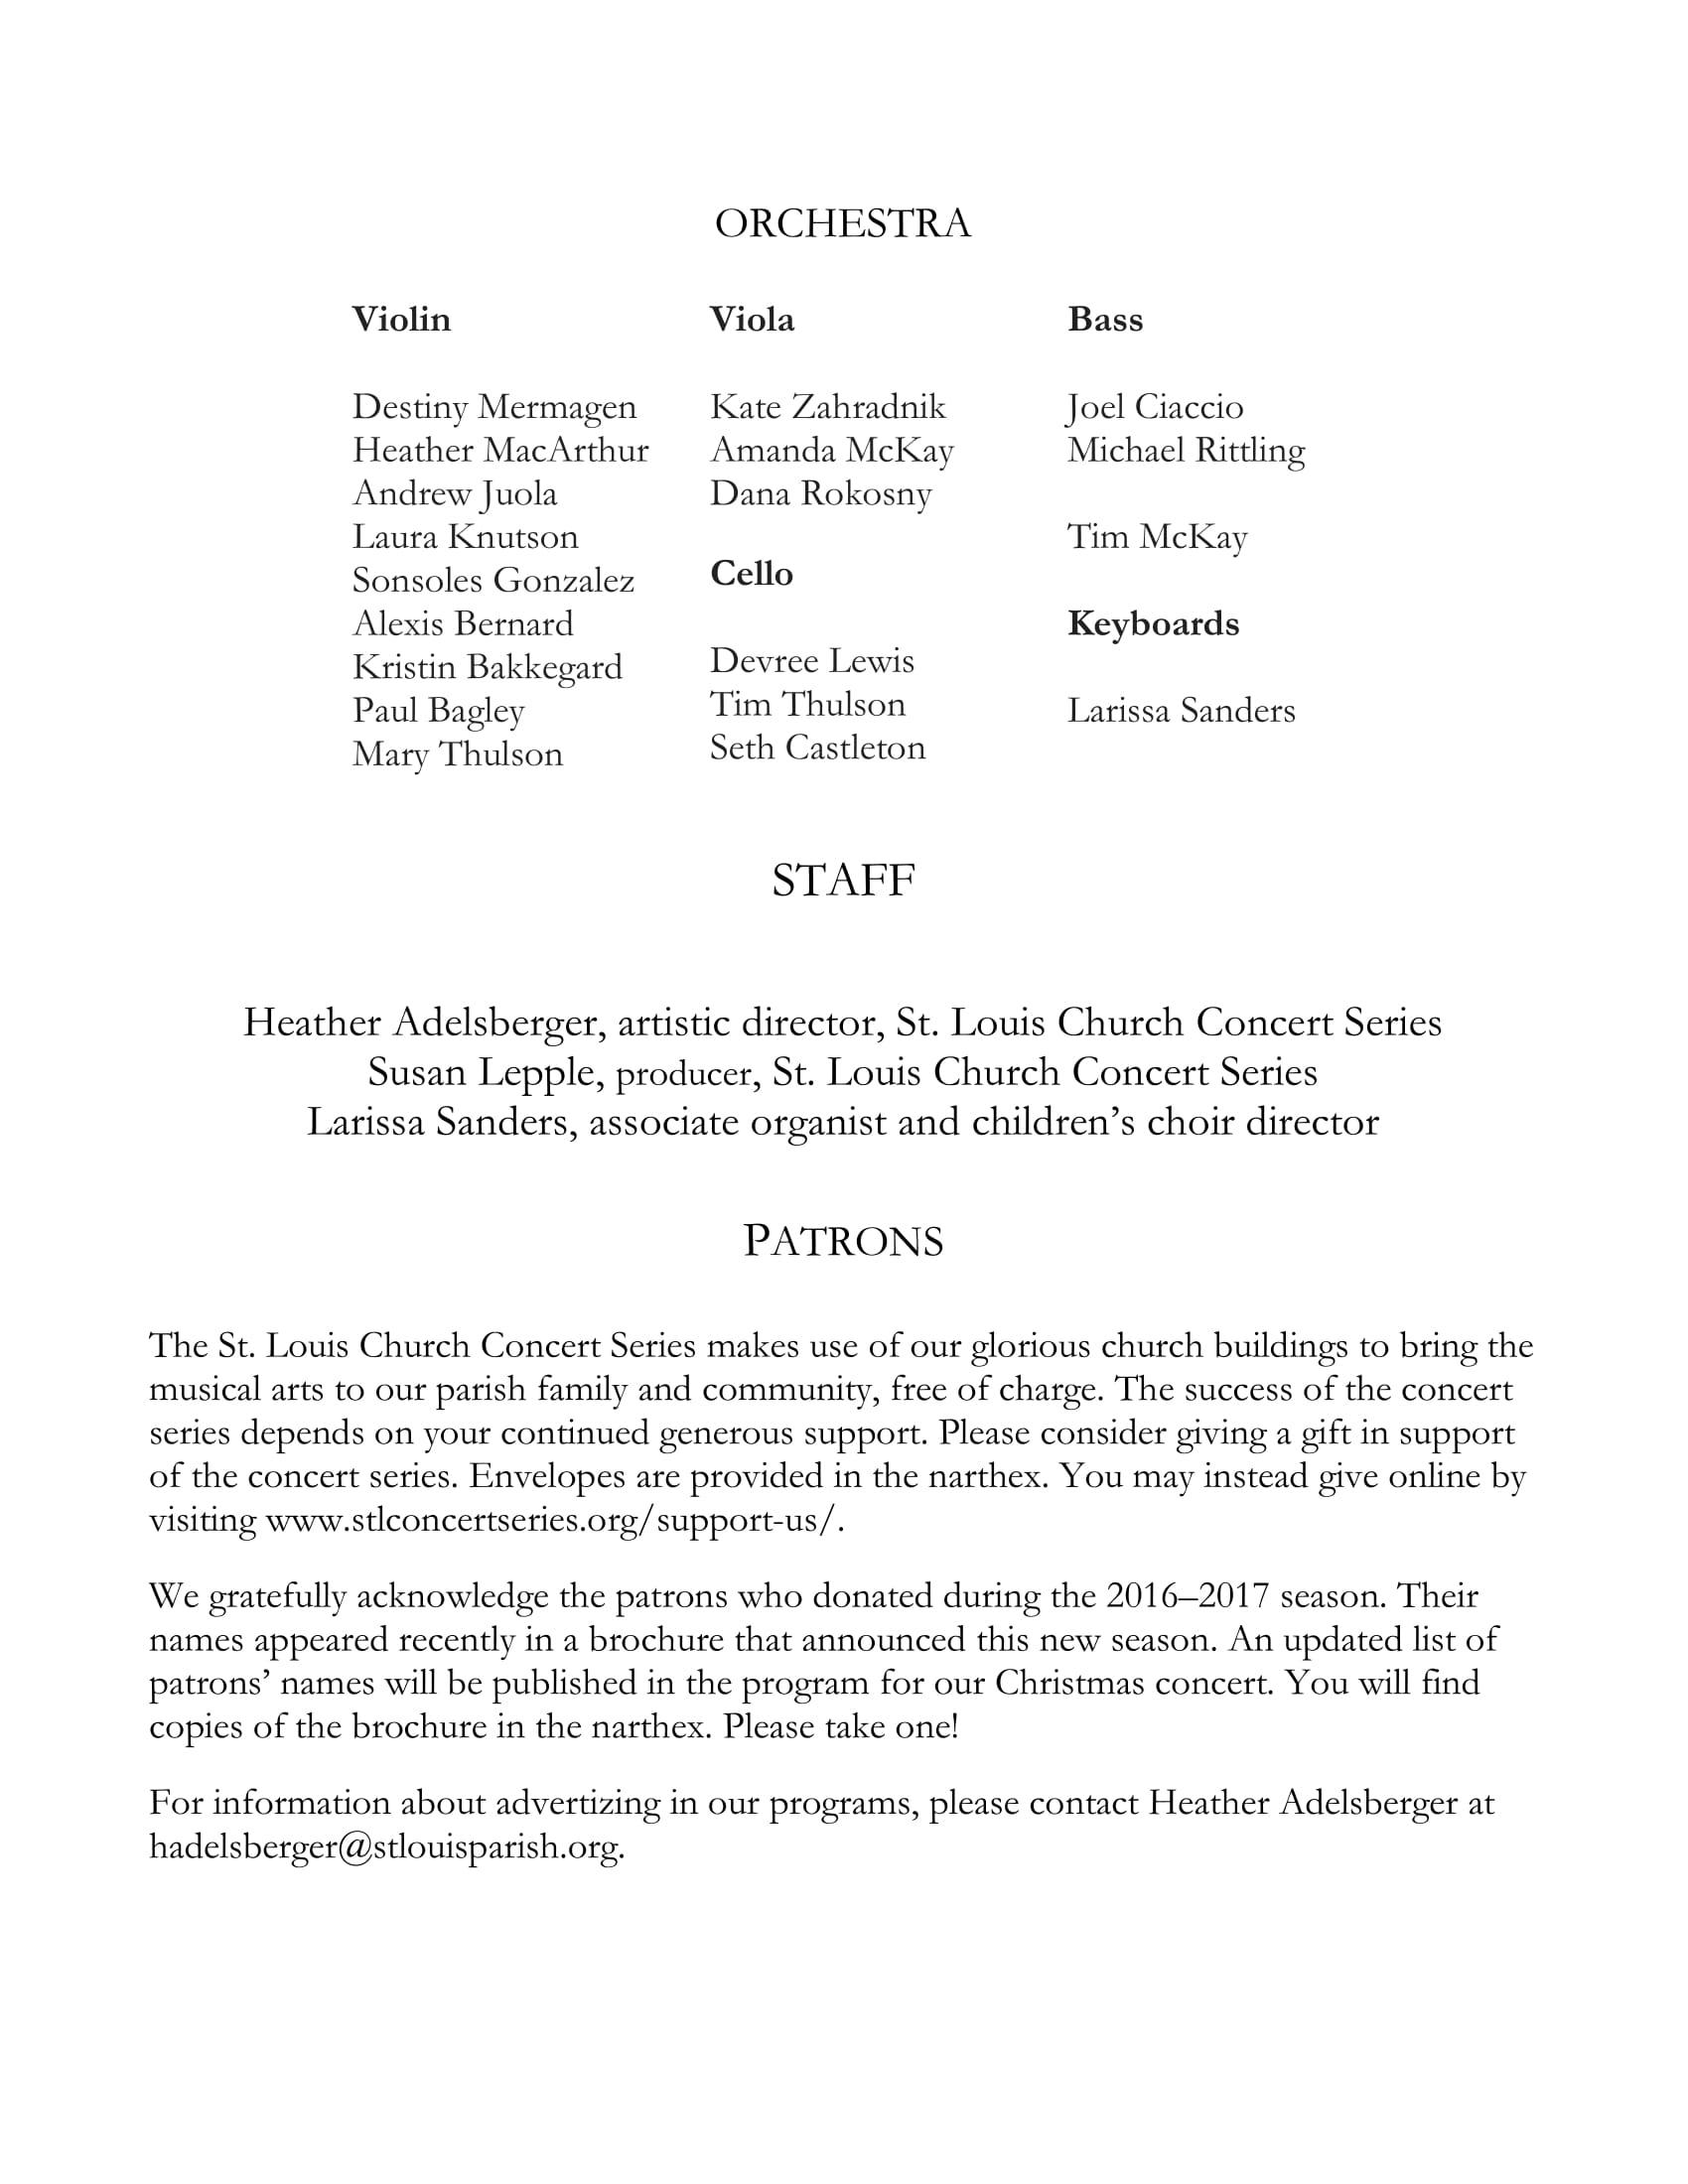 Page-11-1.jpg